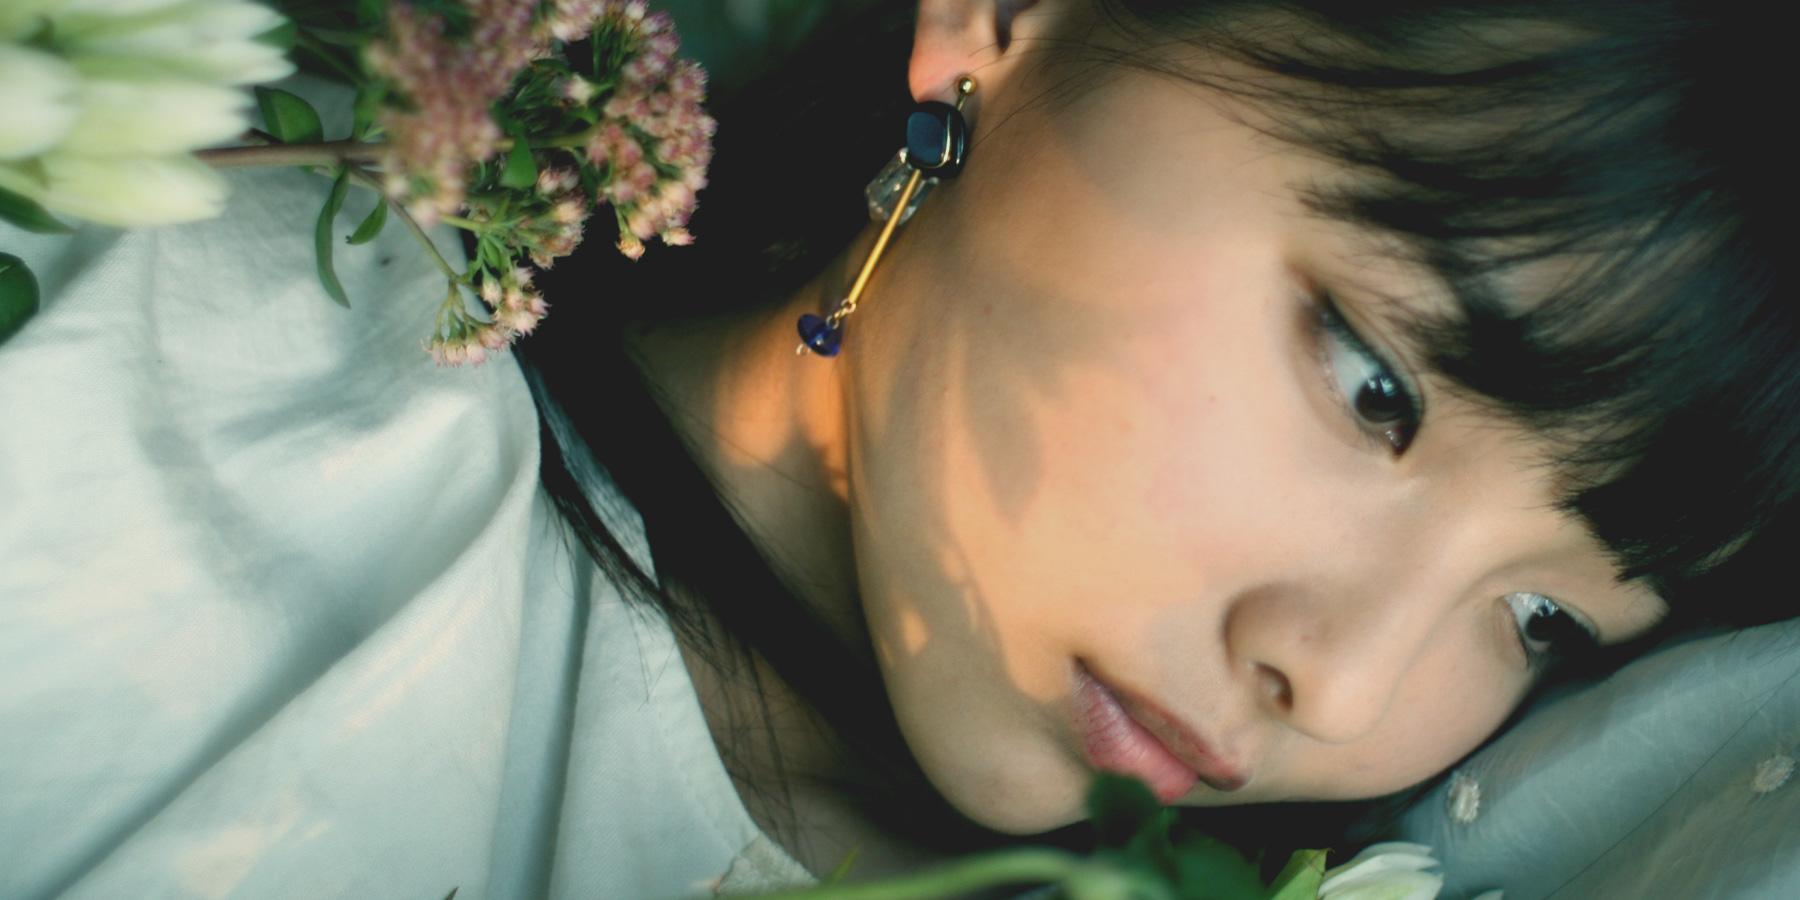 BOTTLE SERIES:Gris by TIROIR/aroma accessoriesアロマアクセサリー/Shellシェル/Earringsイヤリング/Pierceピアス/Braceletブレスレット/Ankletアクンレット/bottle/perfume/香水ボトル/brass真鍮アクセサリー